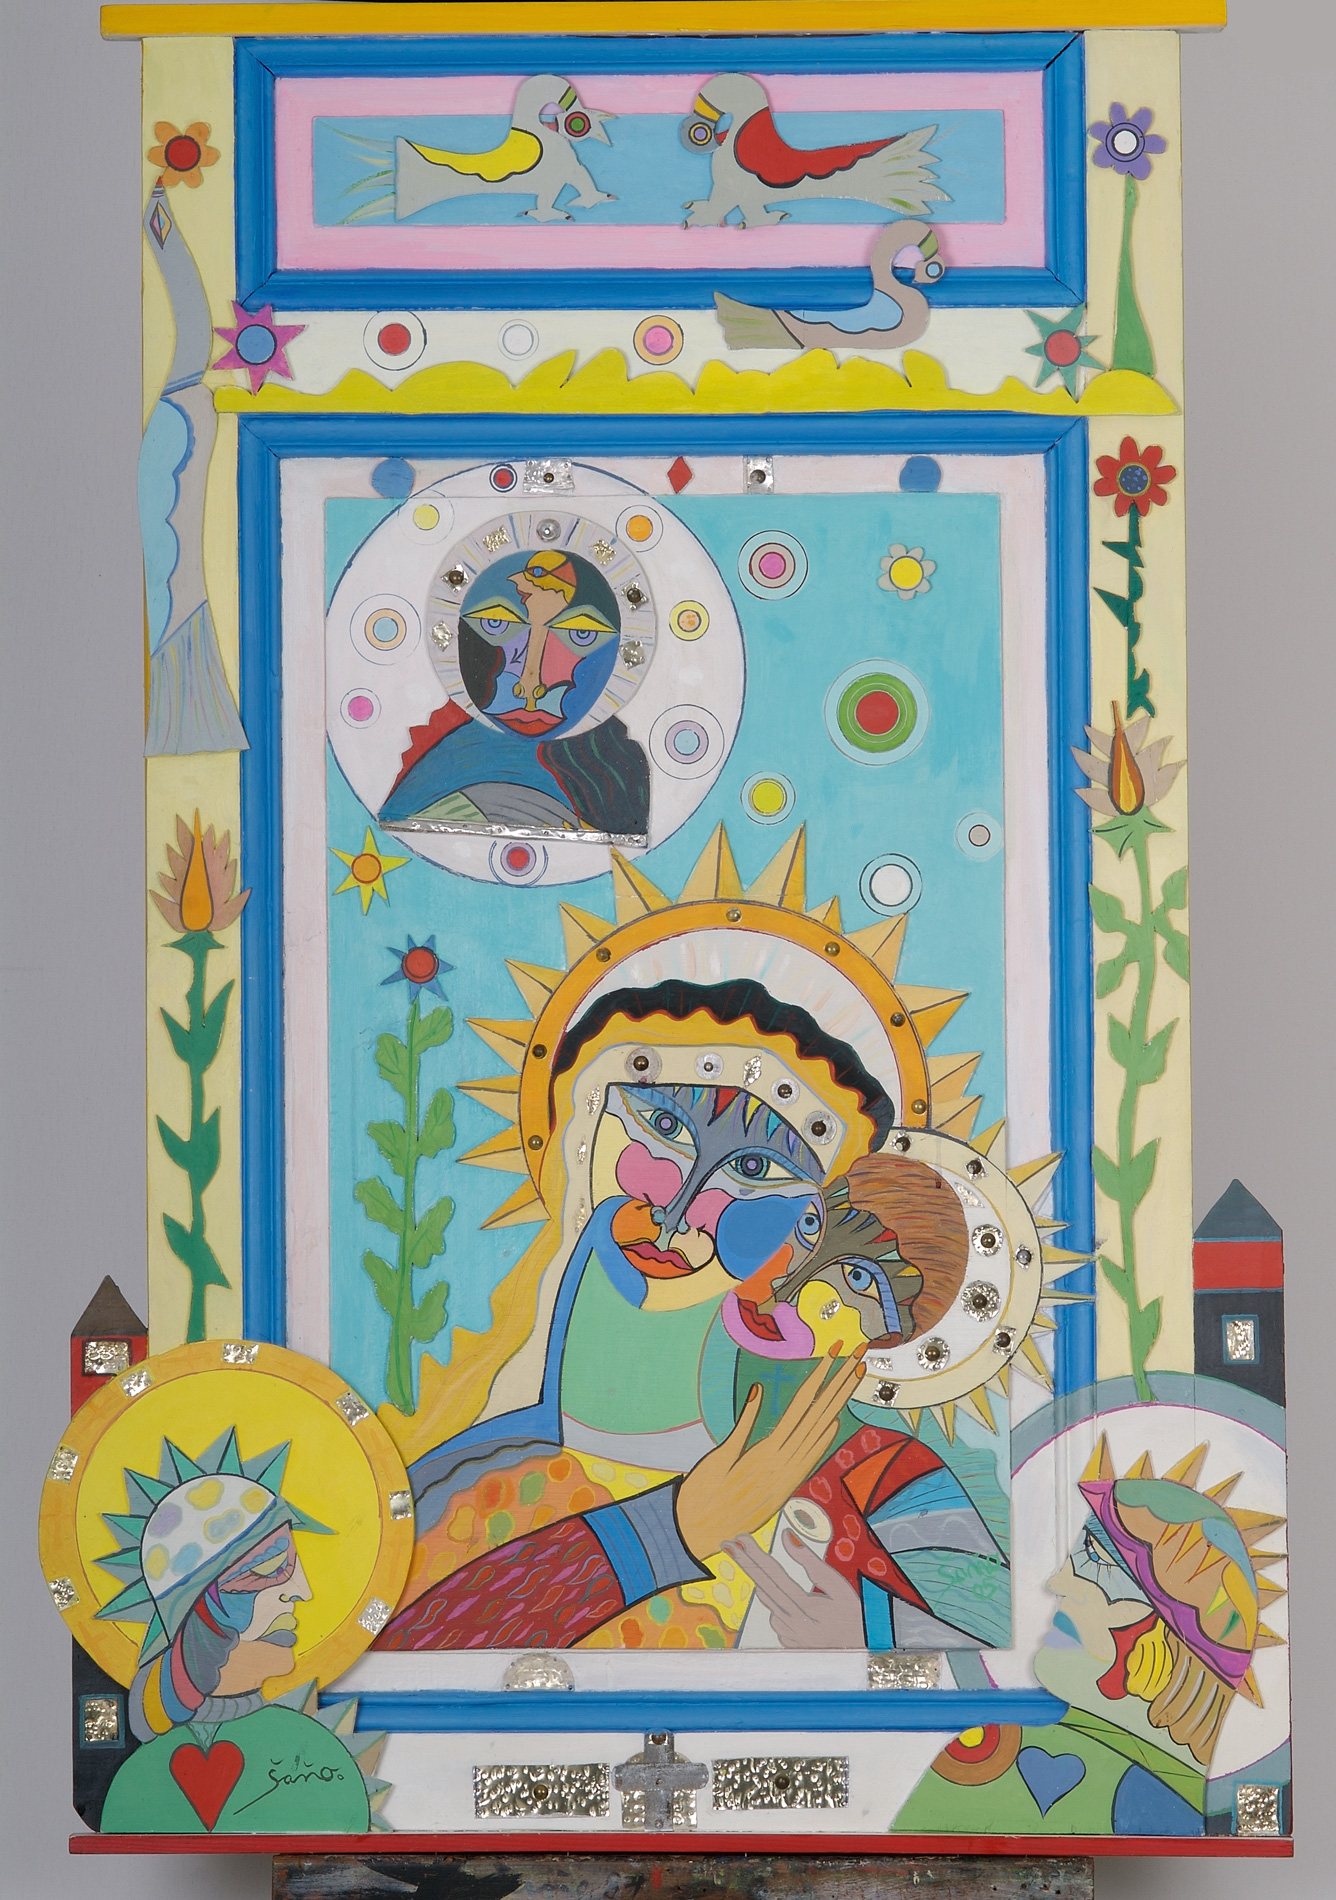 Legende-indienne-sano-ludovit-daniel